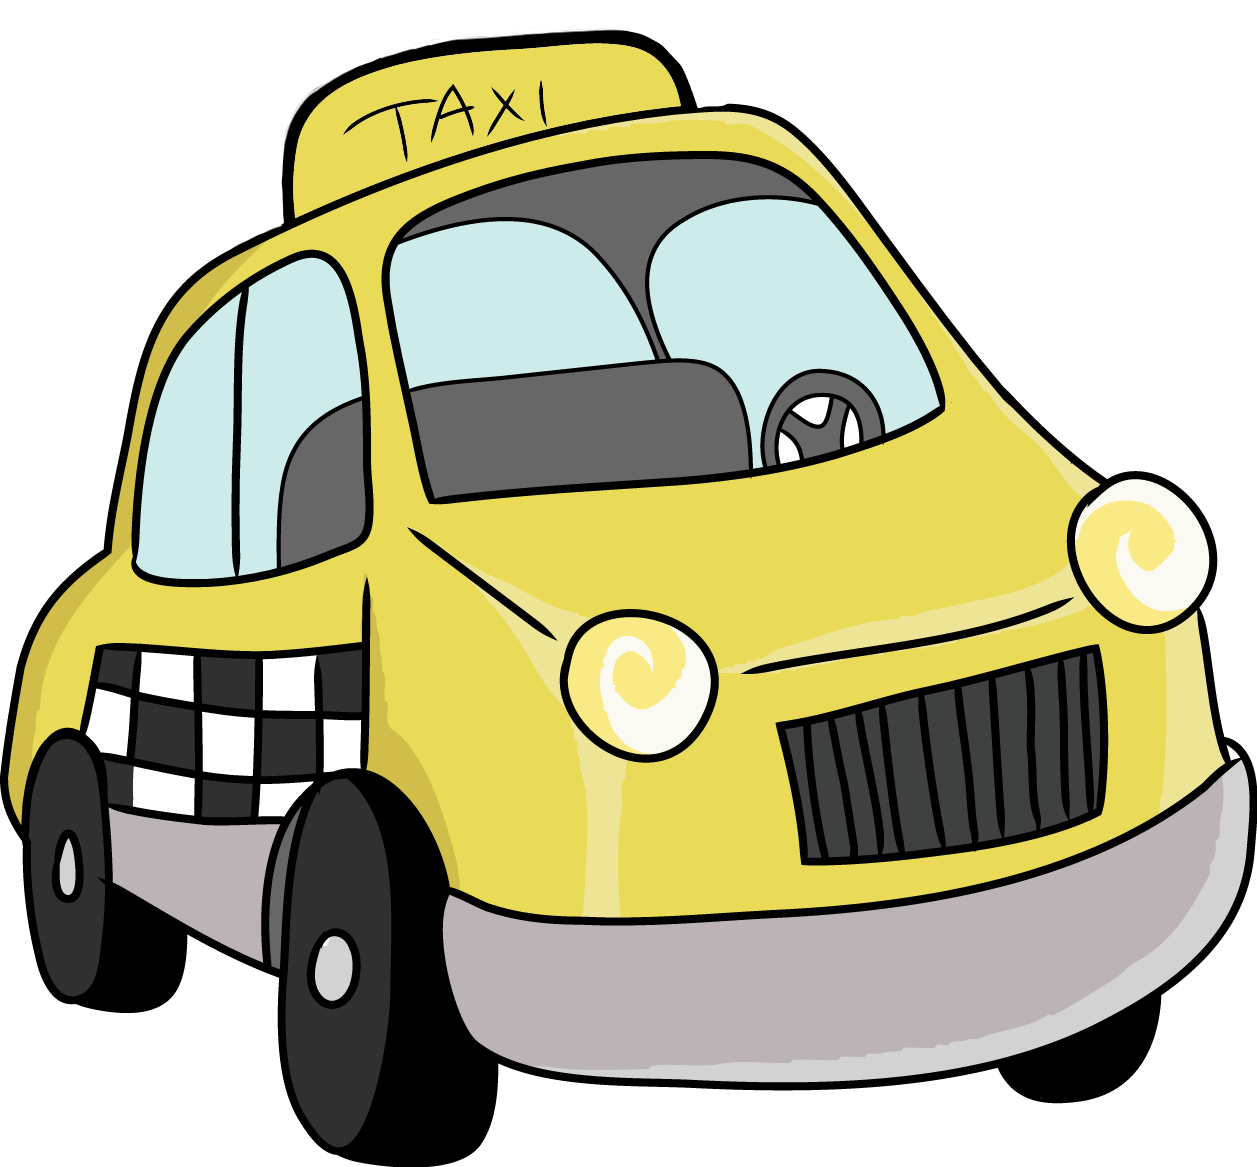 Cartoon Taxi Van Clipart free image.